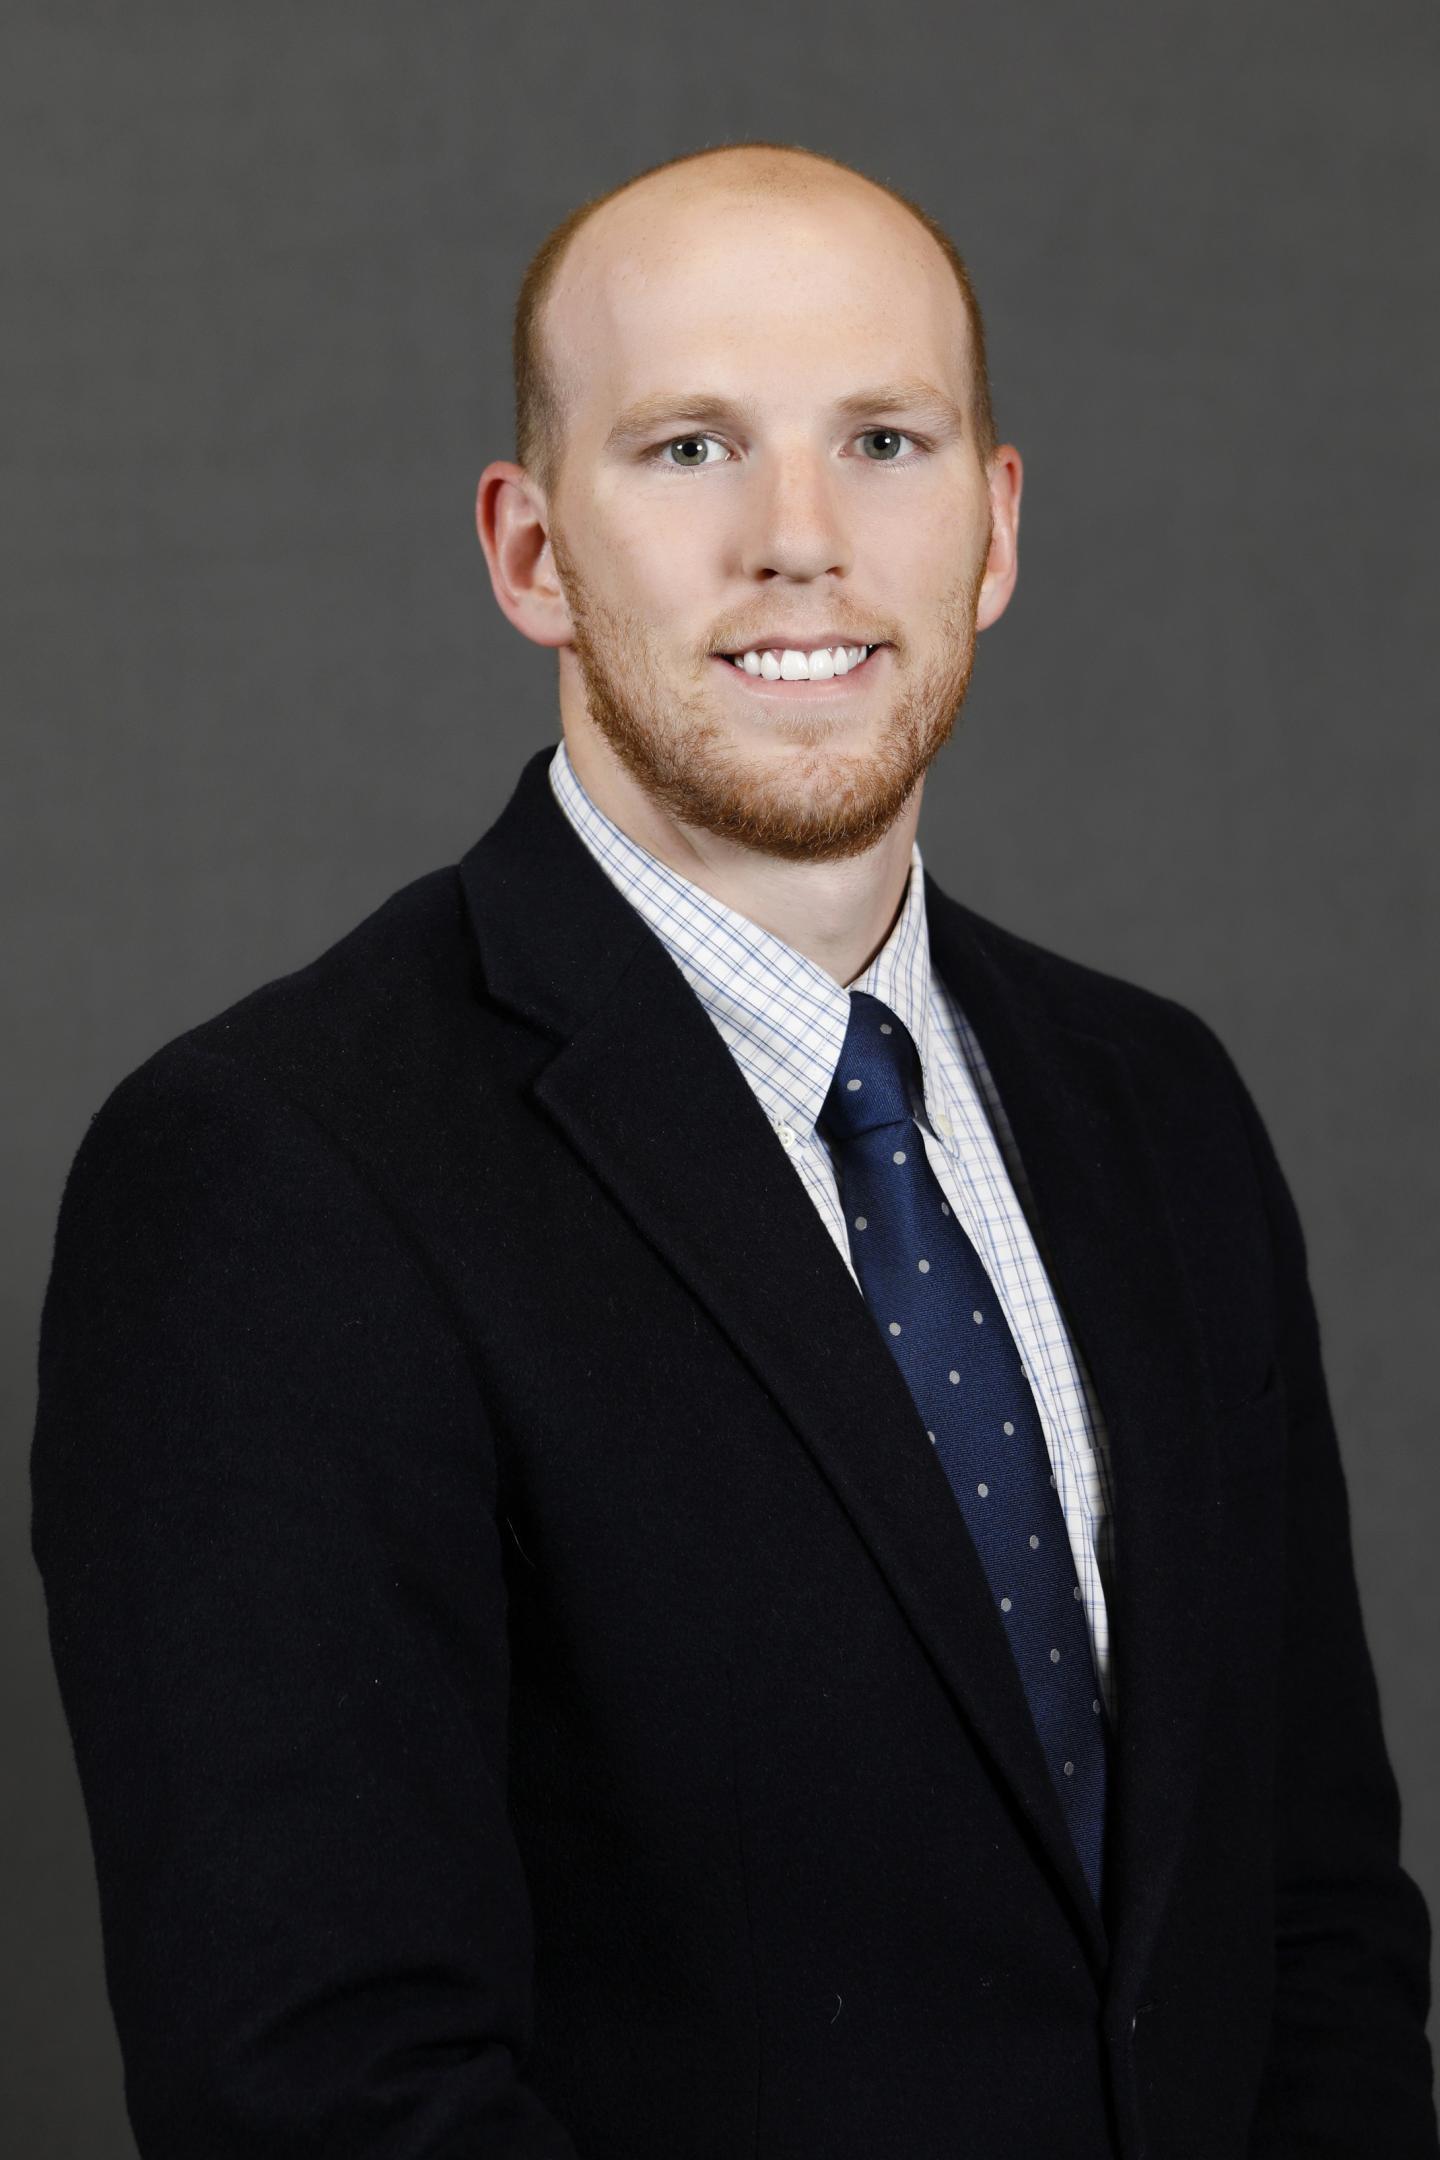 Wayne Crawford, University of Texas at Arlington